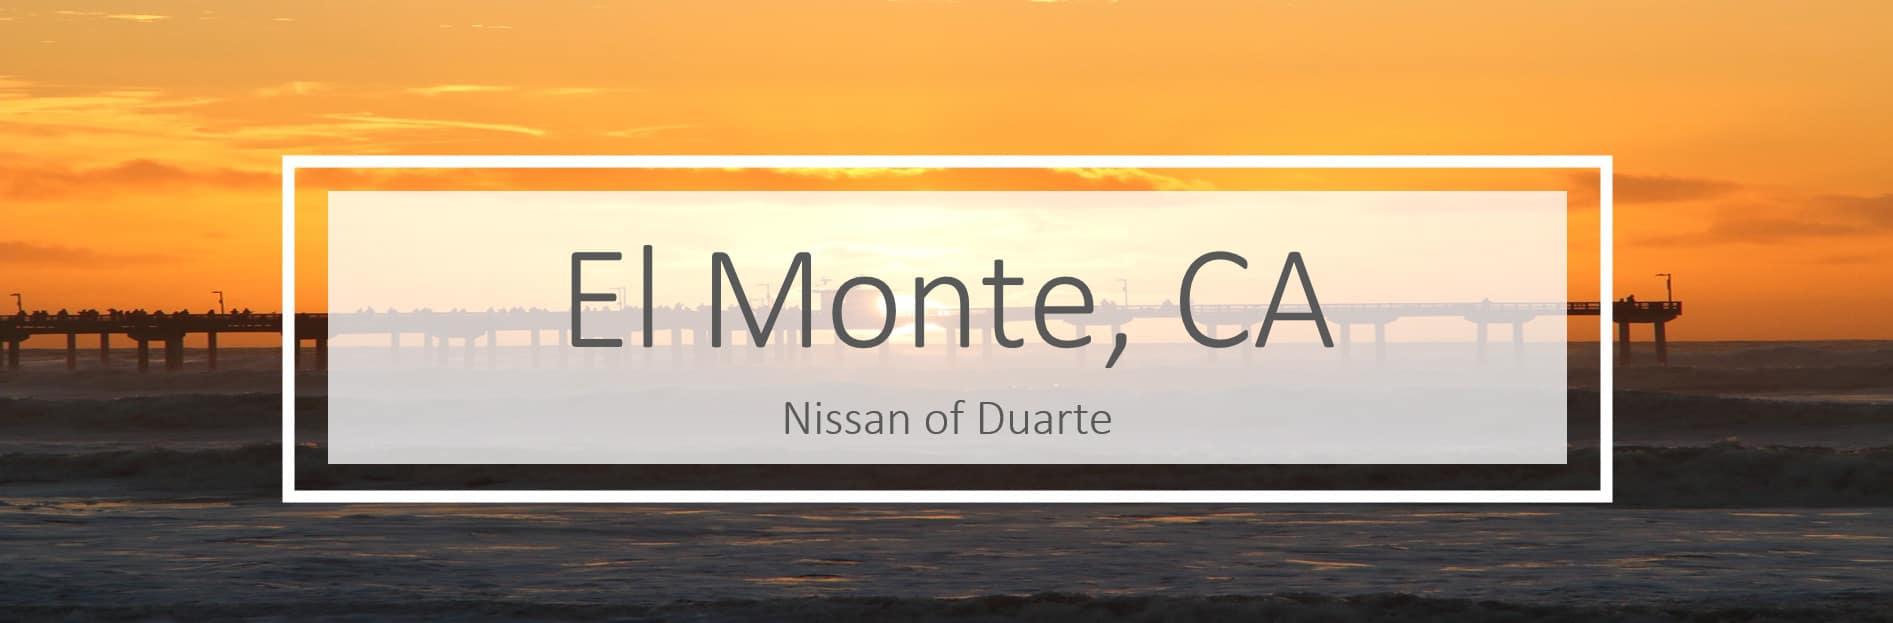 Nissan of Duarte Serving El Monte, CA